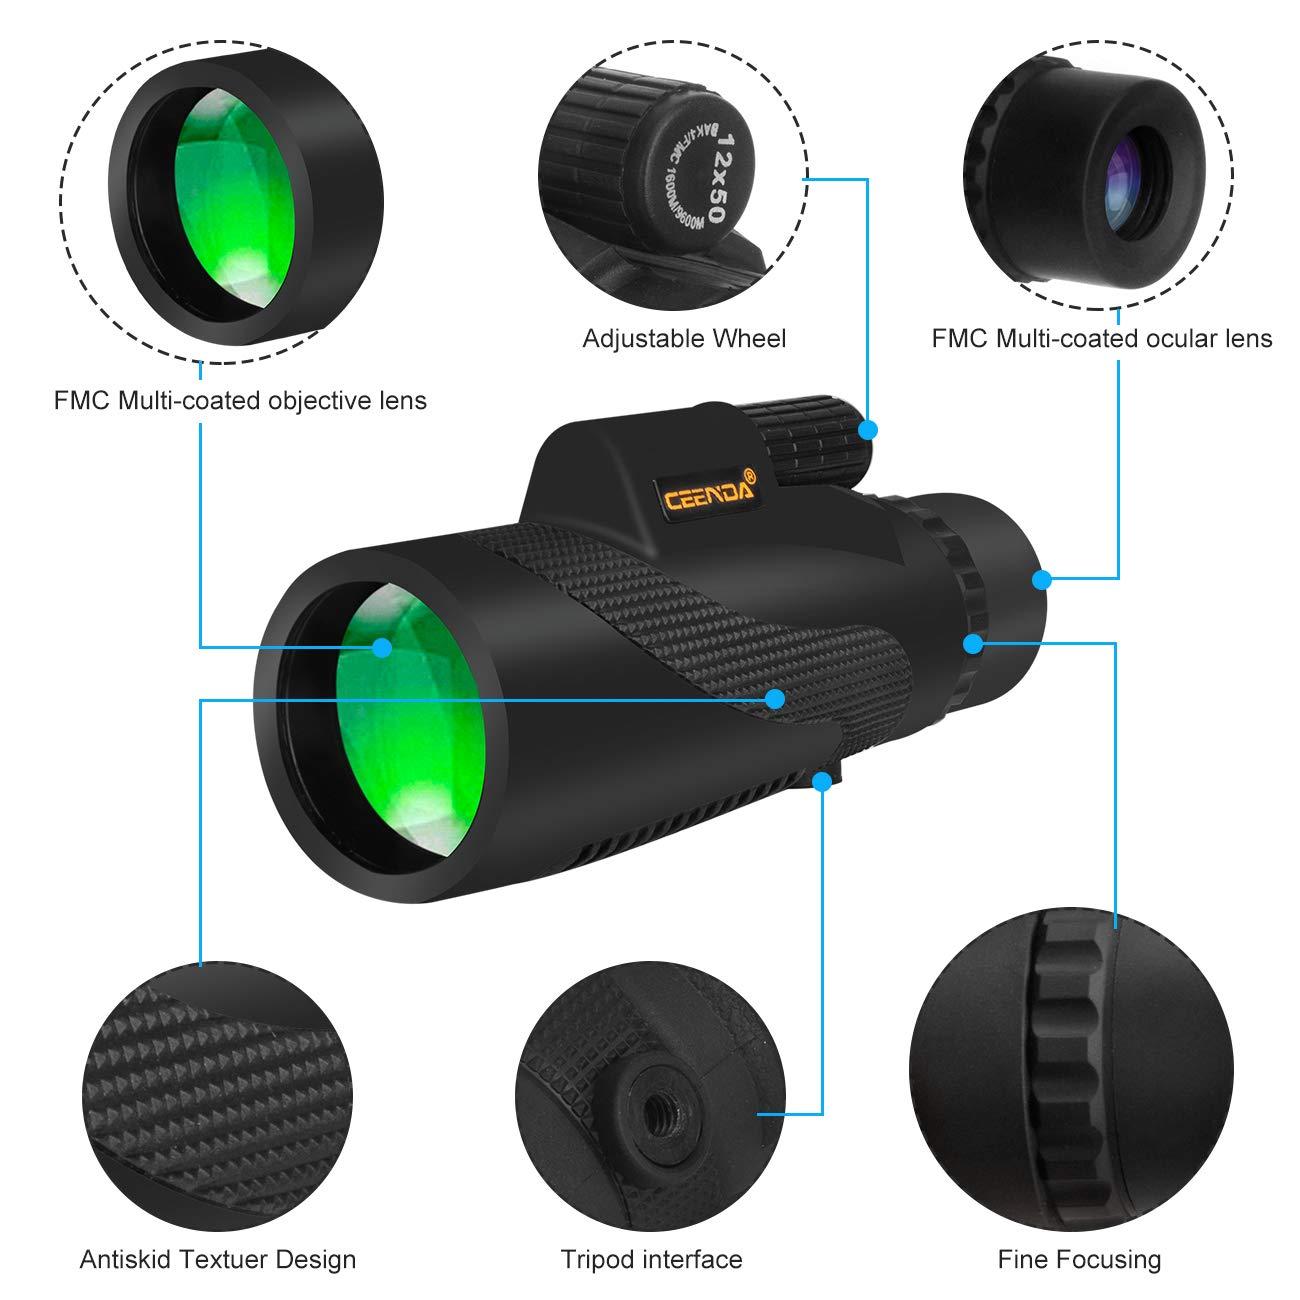 Amazon.com: Ceenda Monocular Telescope,12x50 HD BAK4 Prism ...